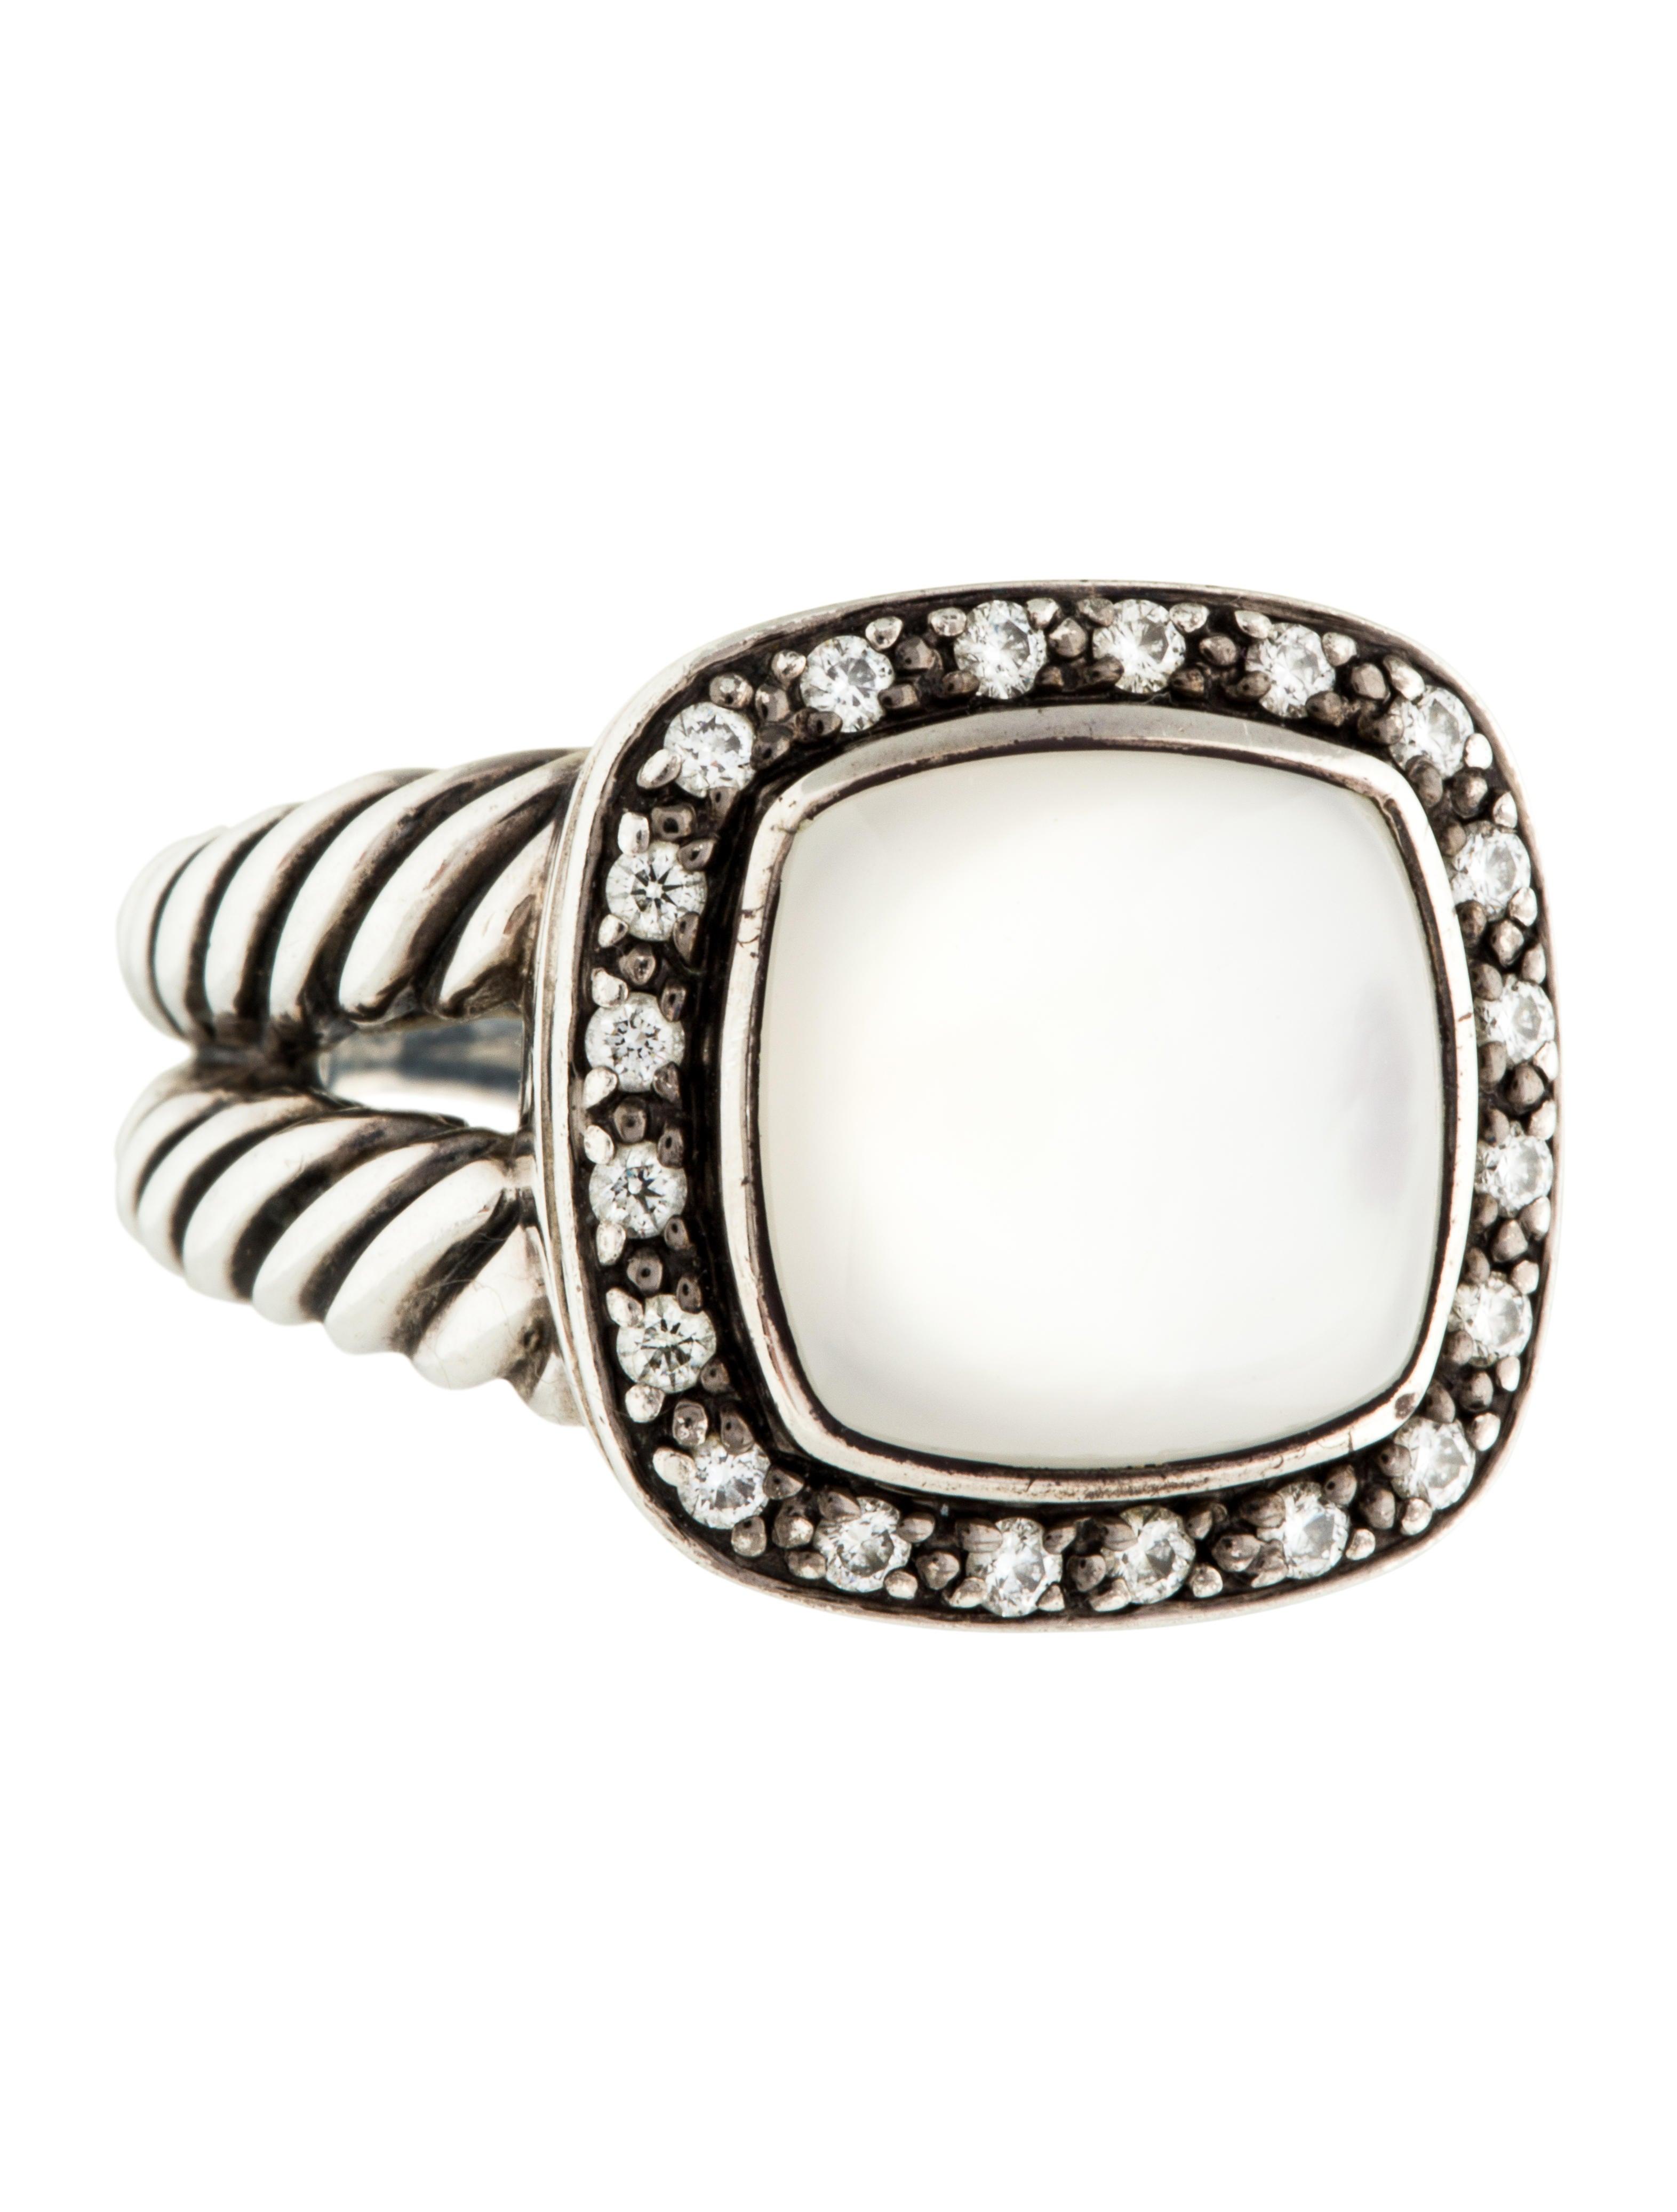 david yurman mother of pearl diamond albion ring rings. Black Bedroom Furniture Sets. Home Design Ideas